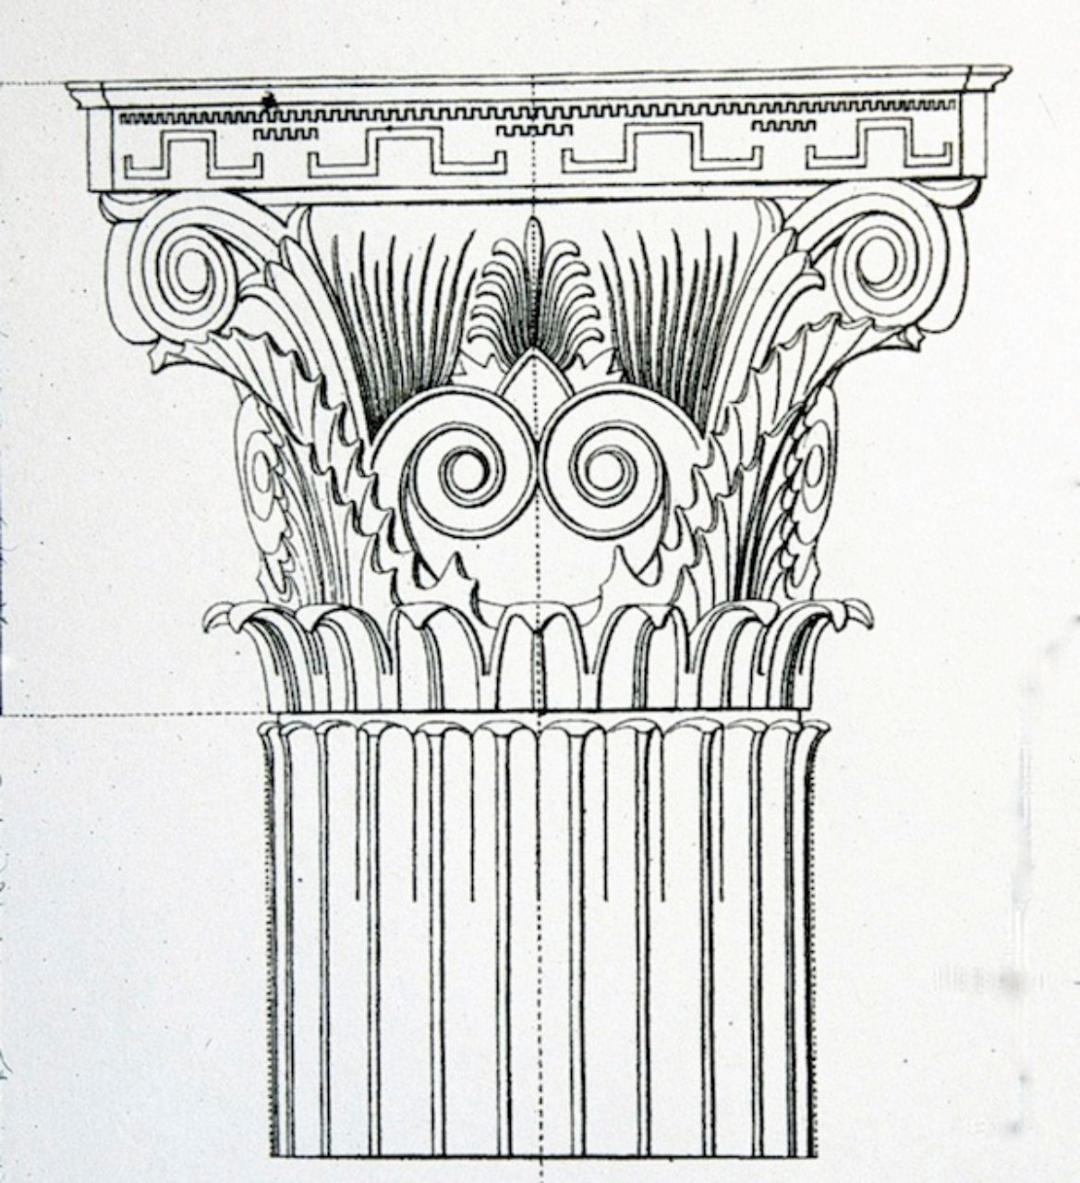 korinthoszi1.jpg